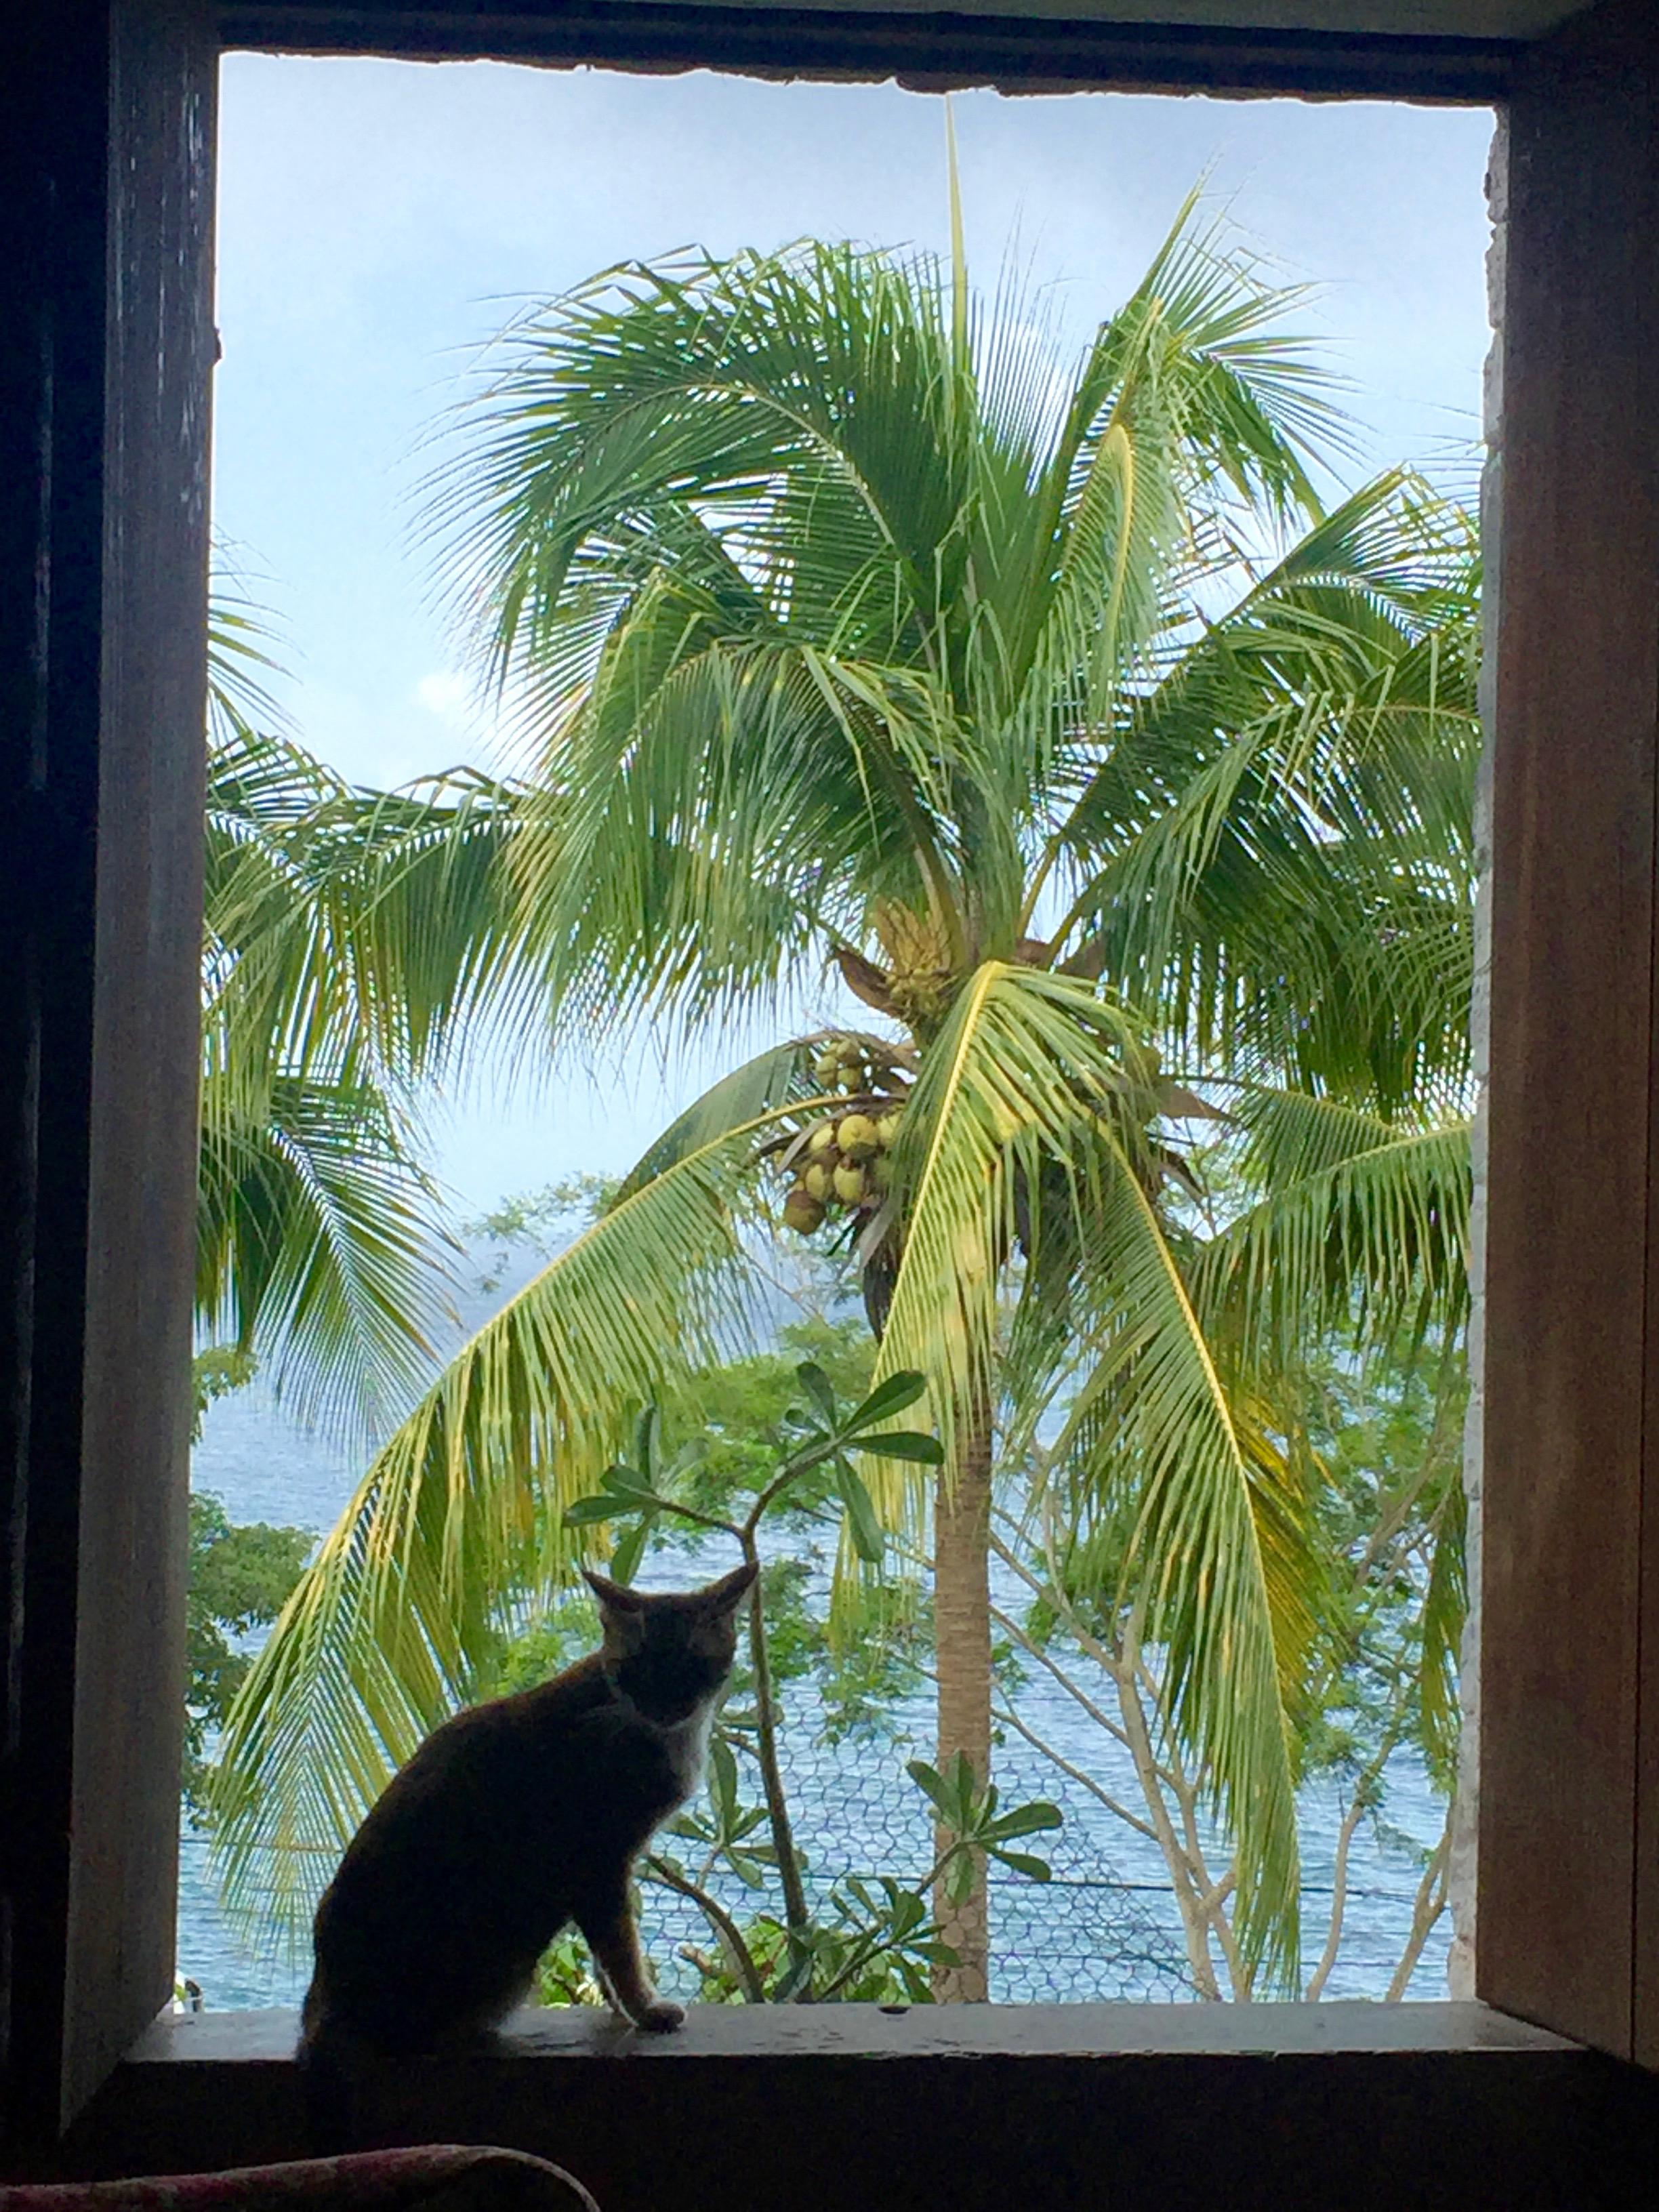 kass ja kookospalm